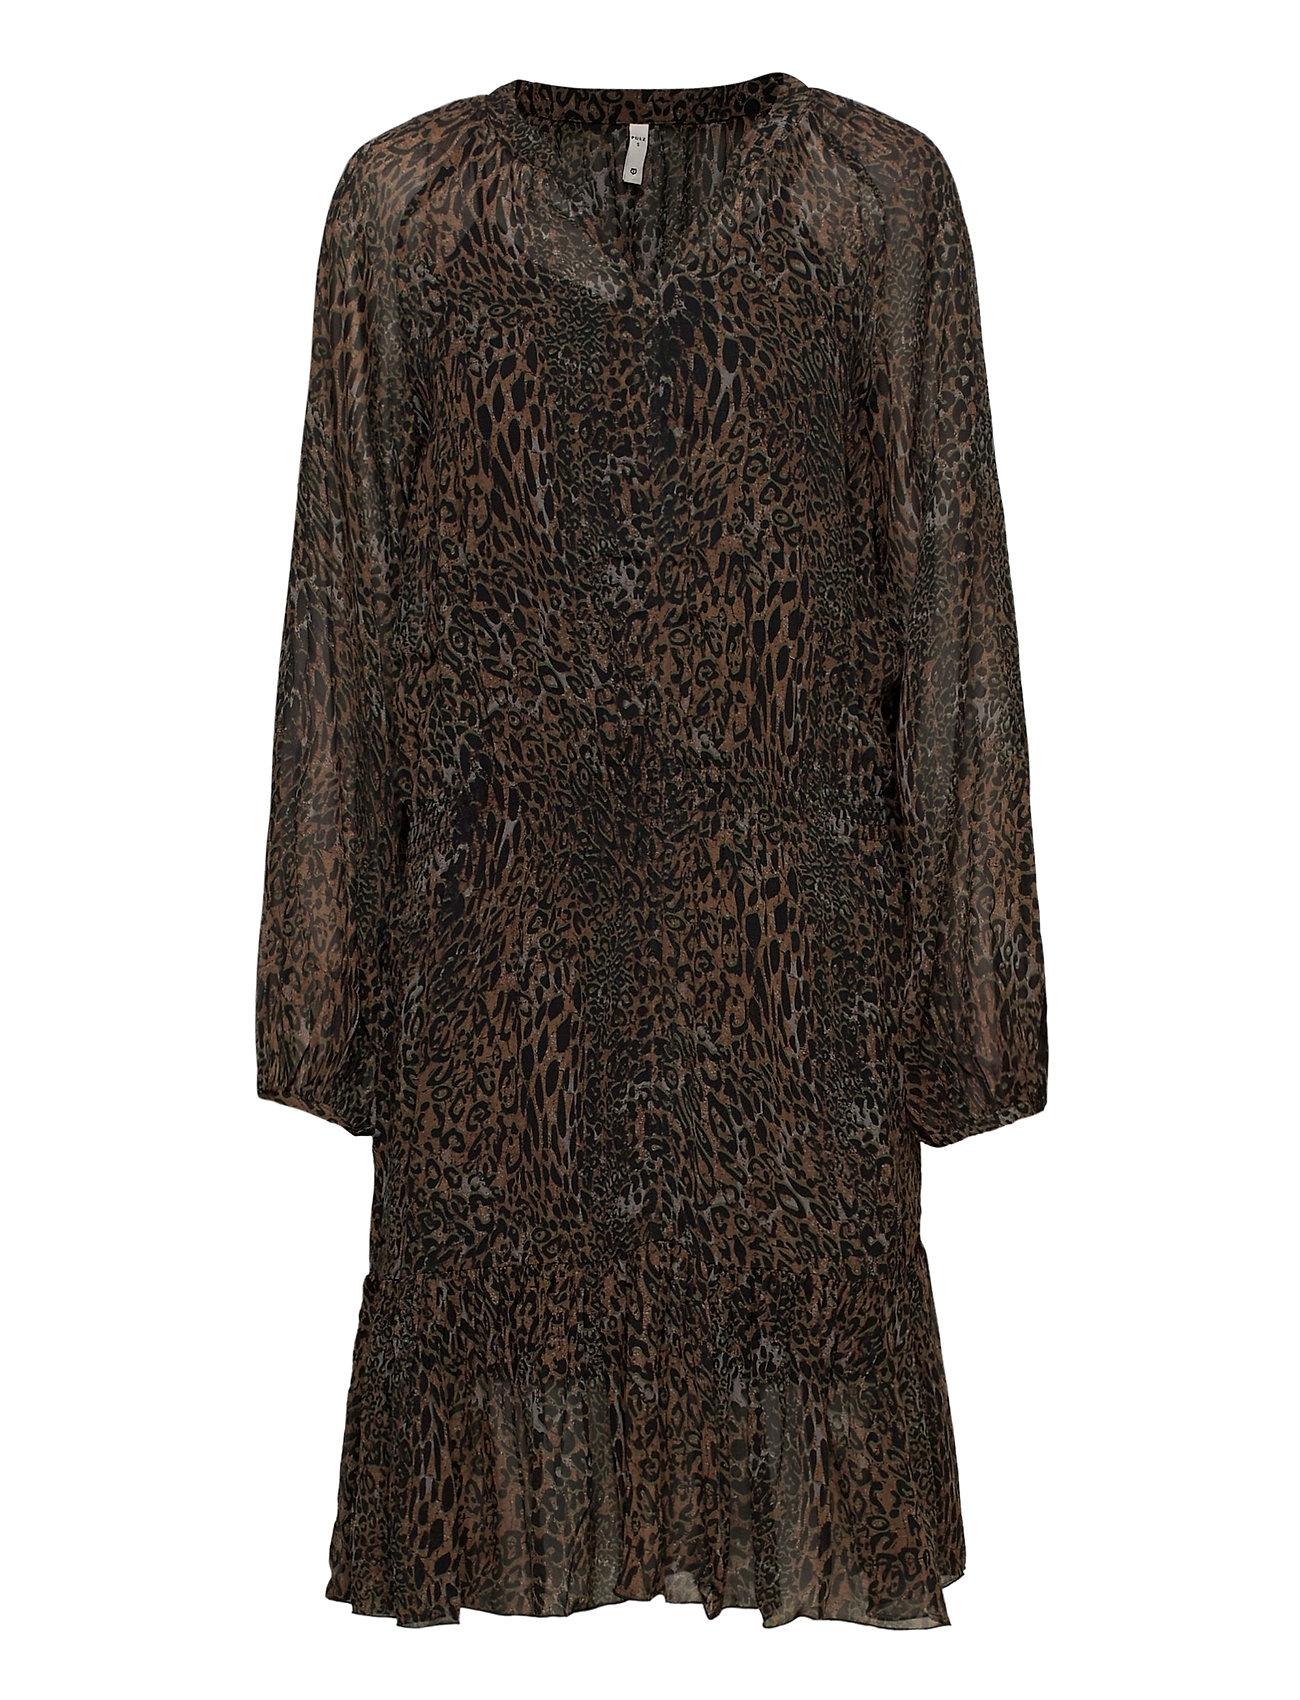 Image of Pzamaya Dress Premium Quality Knælang Kjole Sort Pulz Jeans (3455222989)